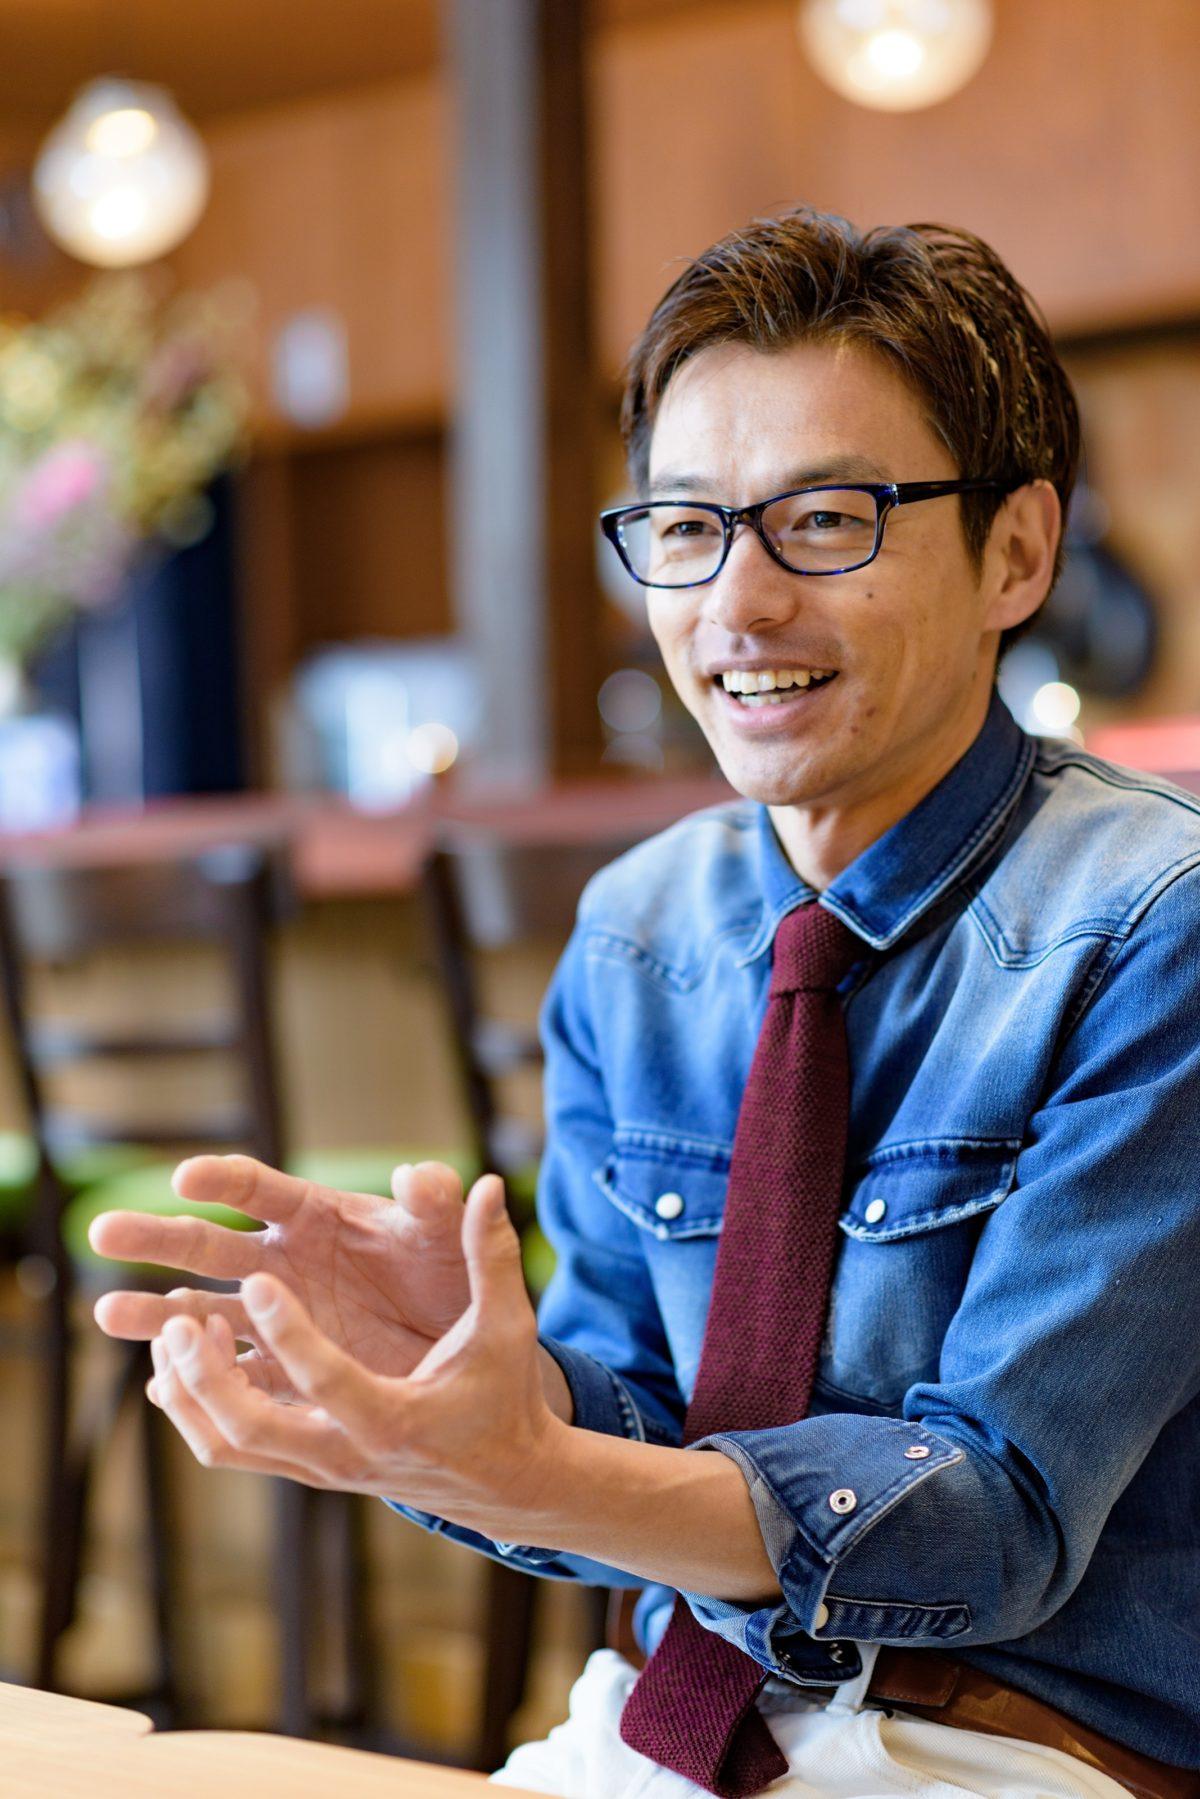 Okaffe Kyoto Akihiro Okada